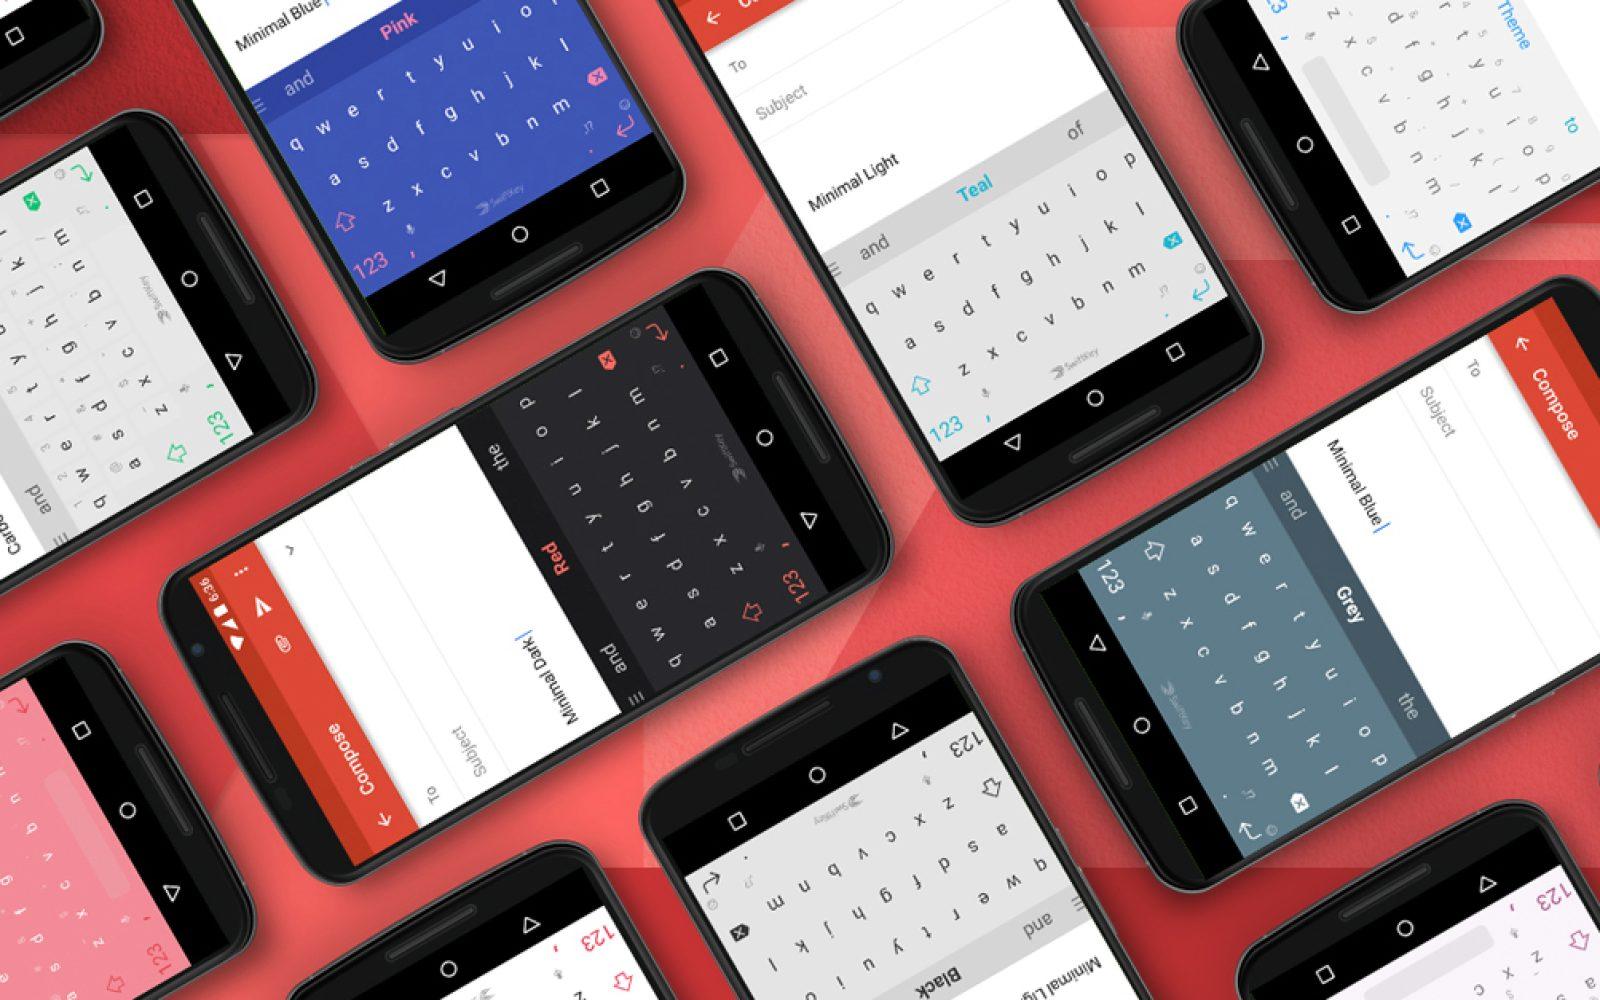 Microsoft purchases popular keyboard maker SwiftKey for $250